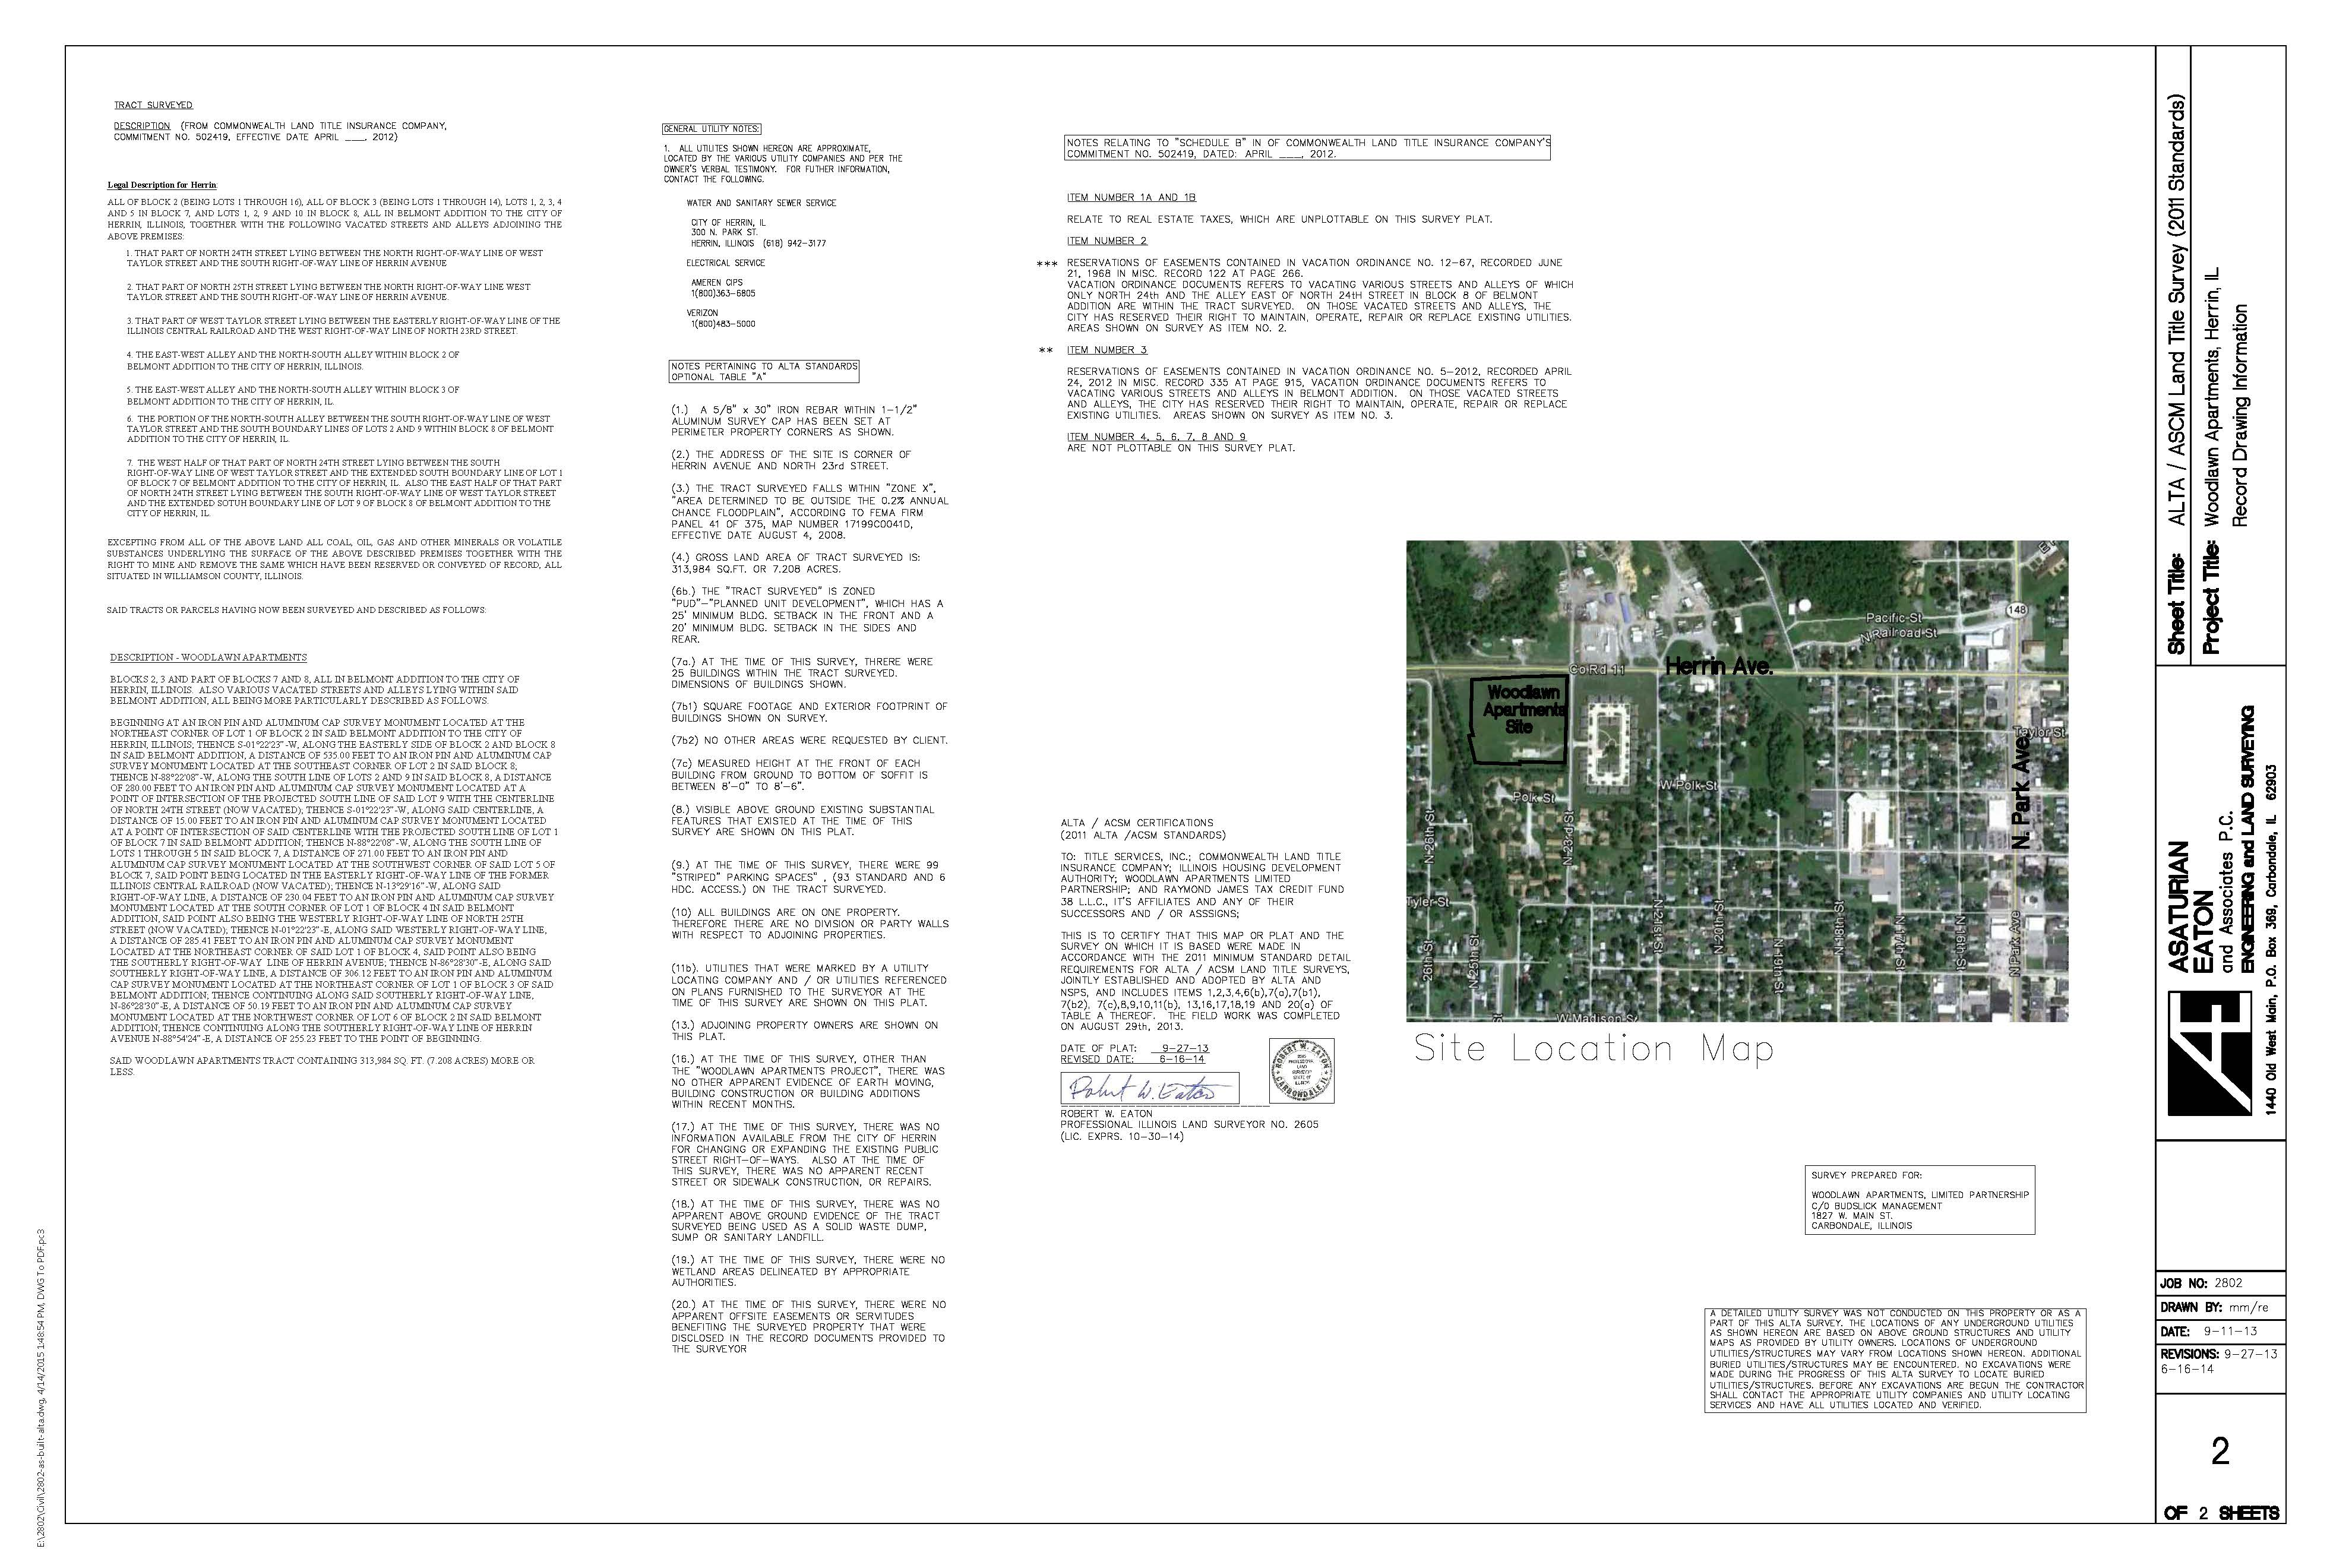 record drawing ALTA Survey 2